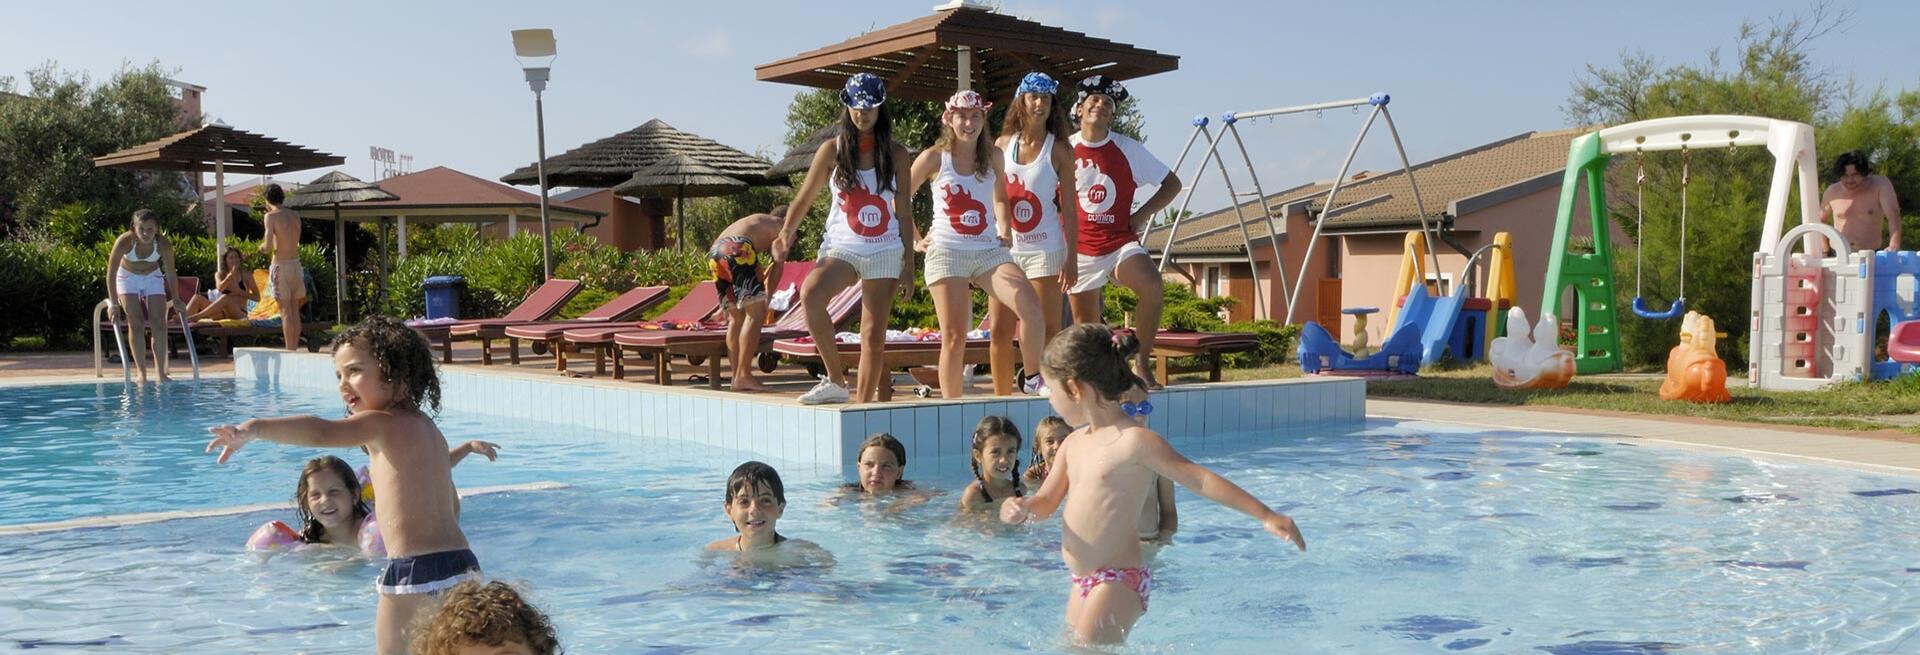 hotelcalarosa de serviceleistungen 014